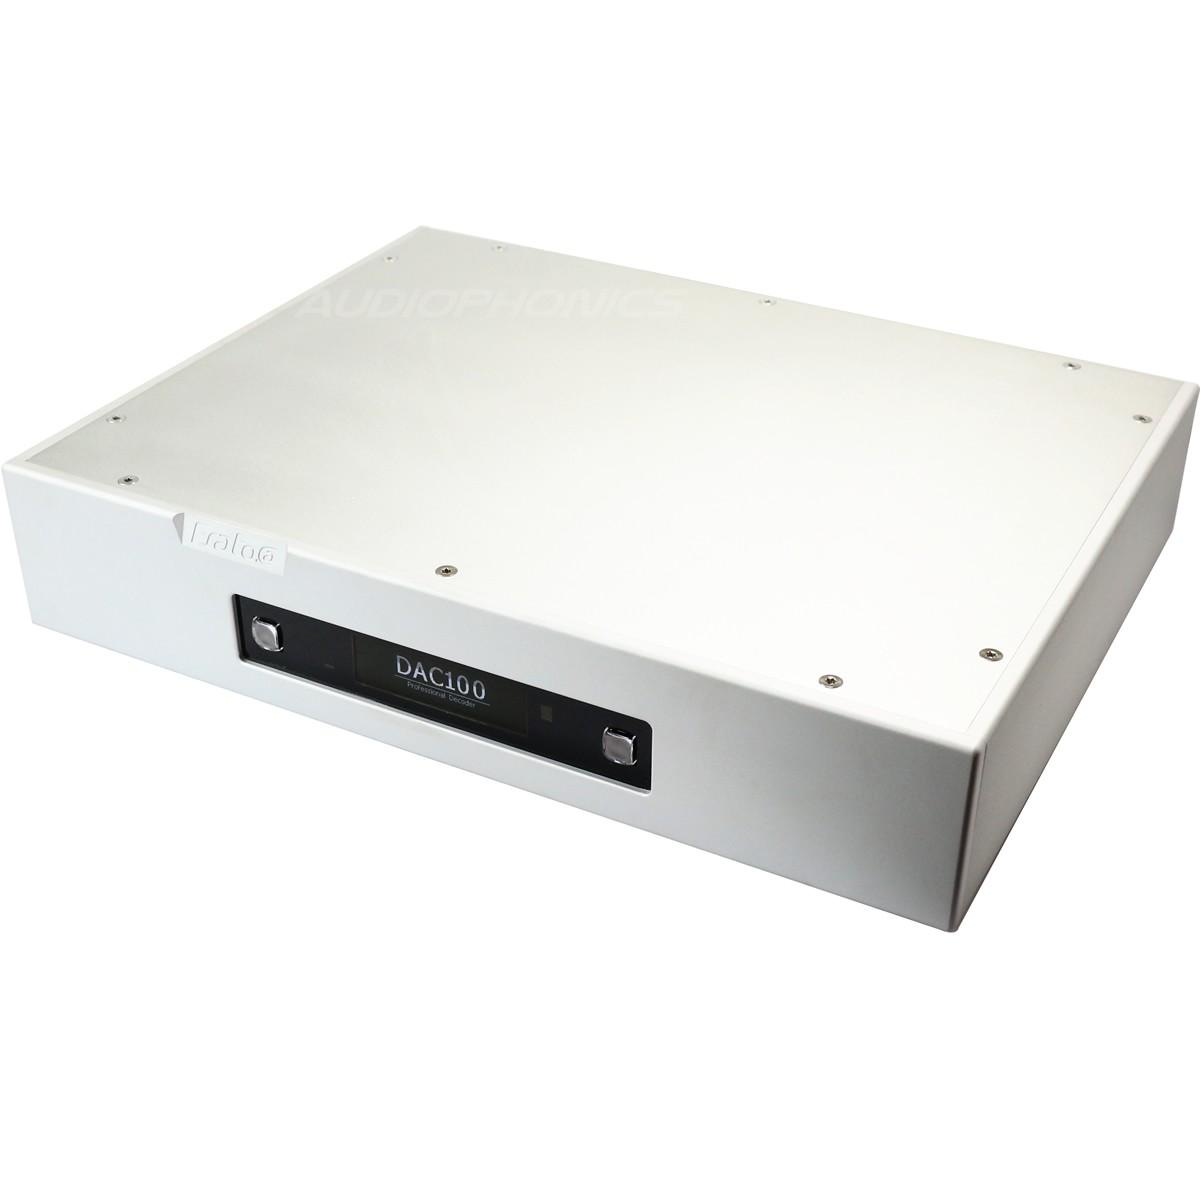 ERATO DAC100 V1 Balanced DAC XLR 24bit / 192Khz 2x AK4497 DSD128 XMOS U208